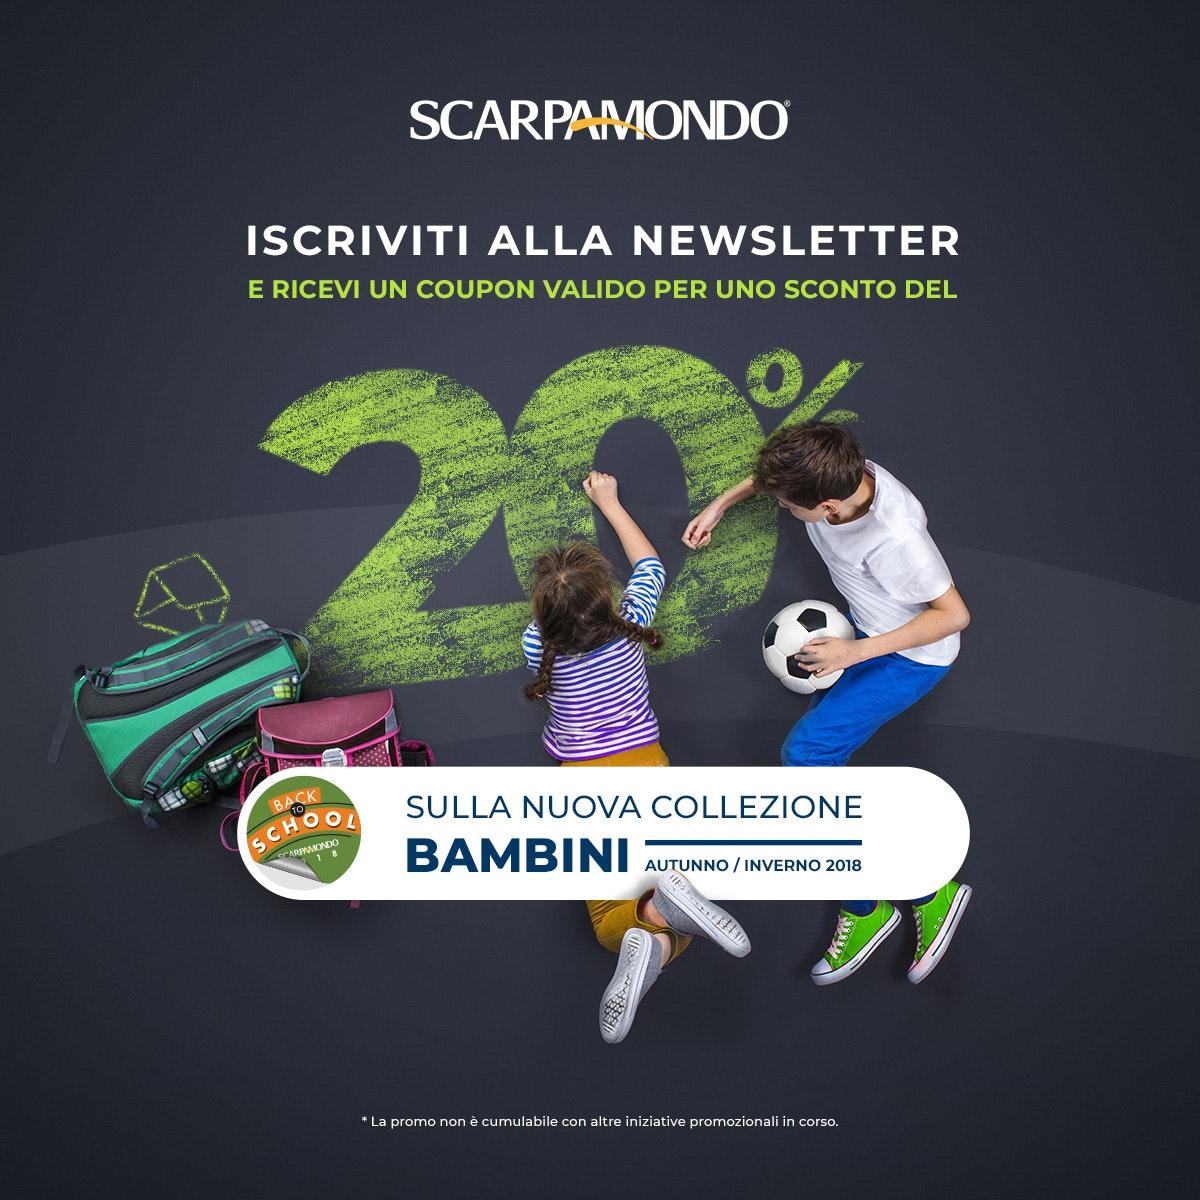 ANCONA_SCARPAMOND_RIBASSI_Post_1200x1200